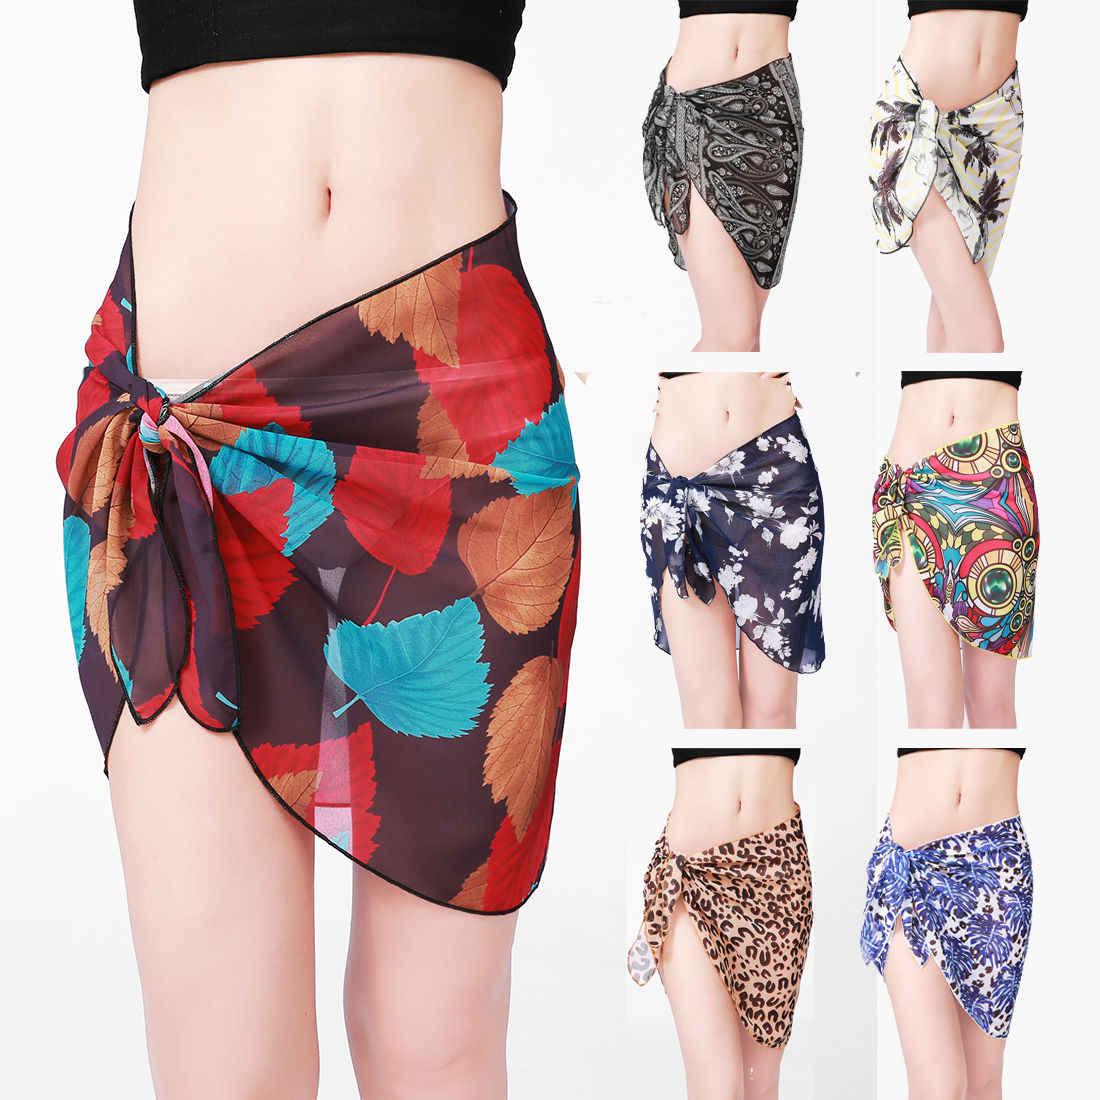 cc7ad0e621422 Sexy Women Cover Up 2017 New Print Chiffon Sarong Pareo Canga Bikini  Swimsuit Cover Up Beach